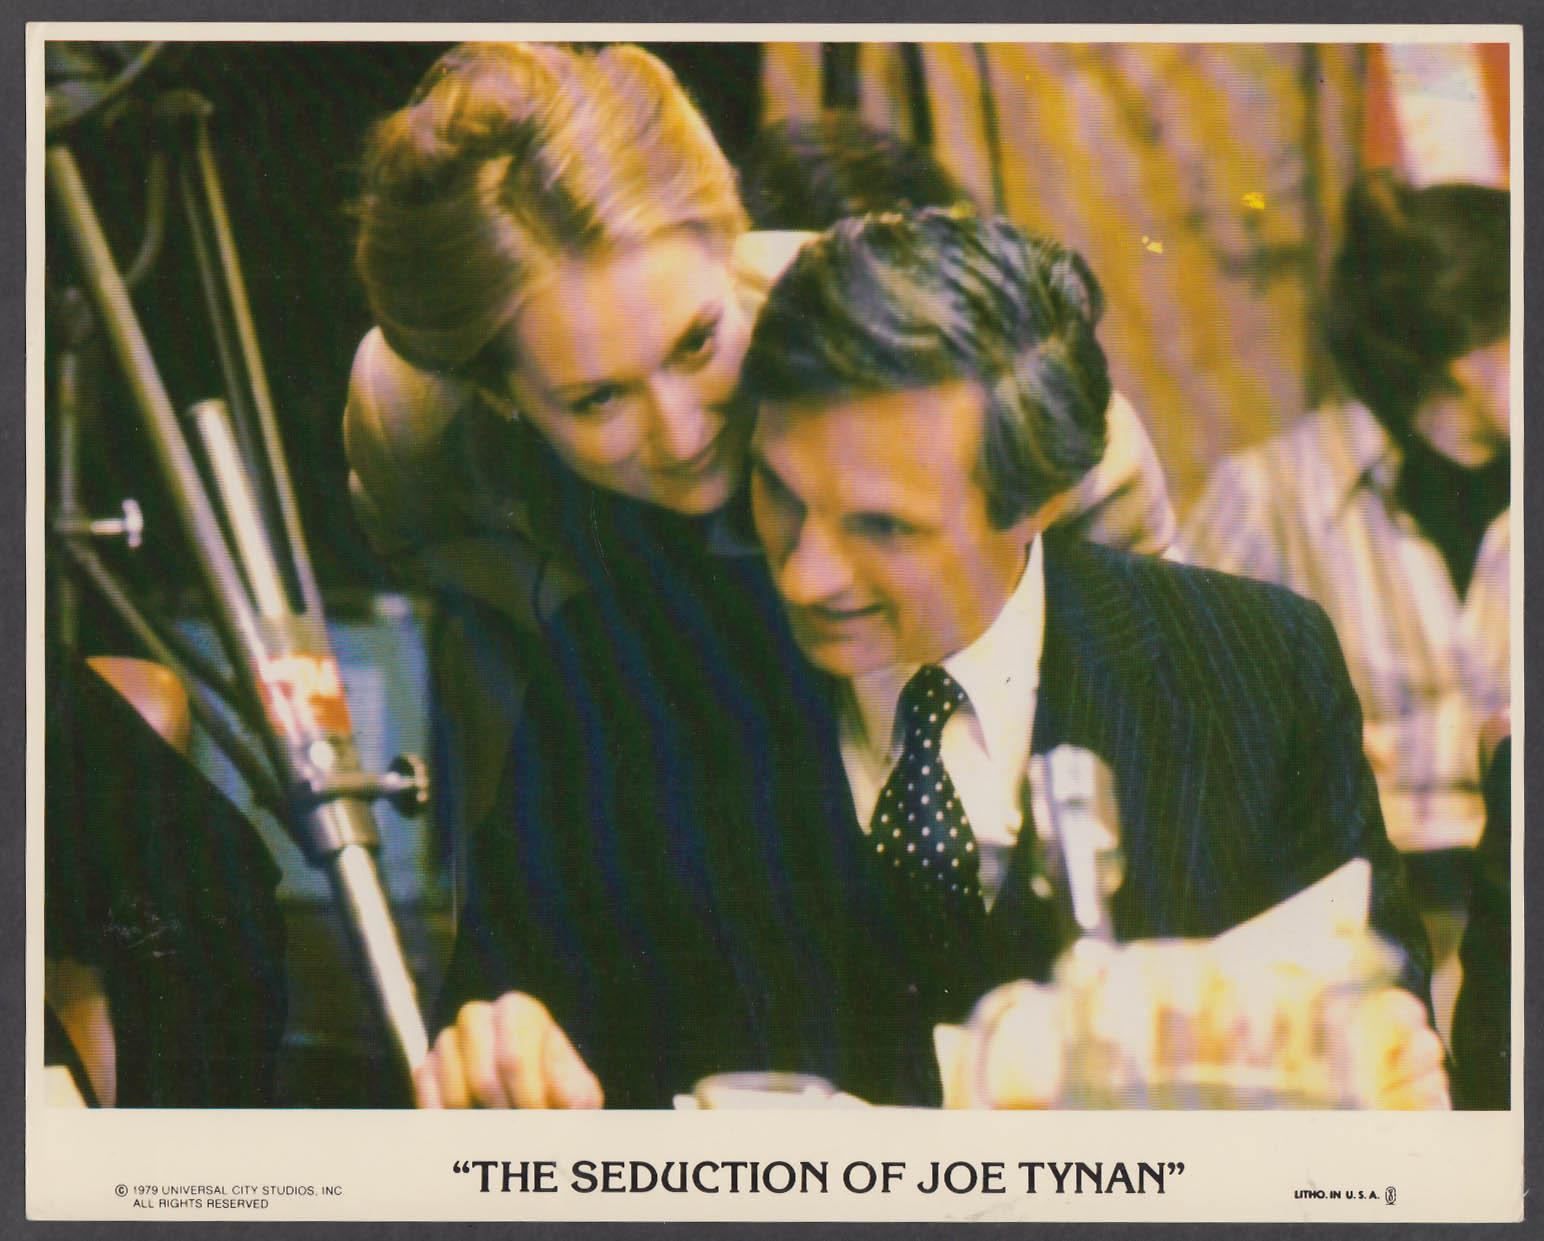 Image for Meryl Streep Alan Alda in The Seduction of Joe Tynan 8x10 lobby card 1979